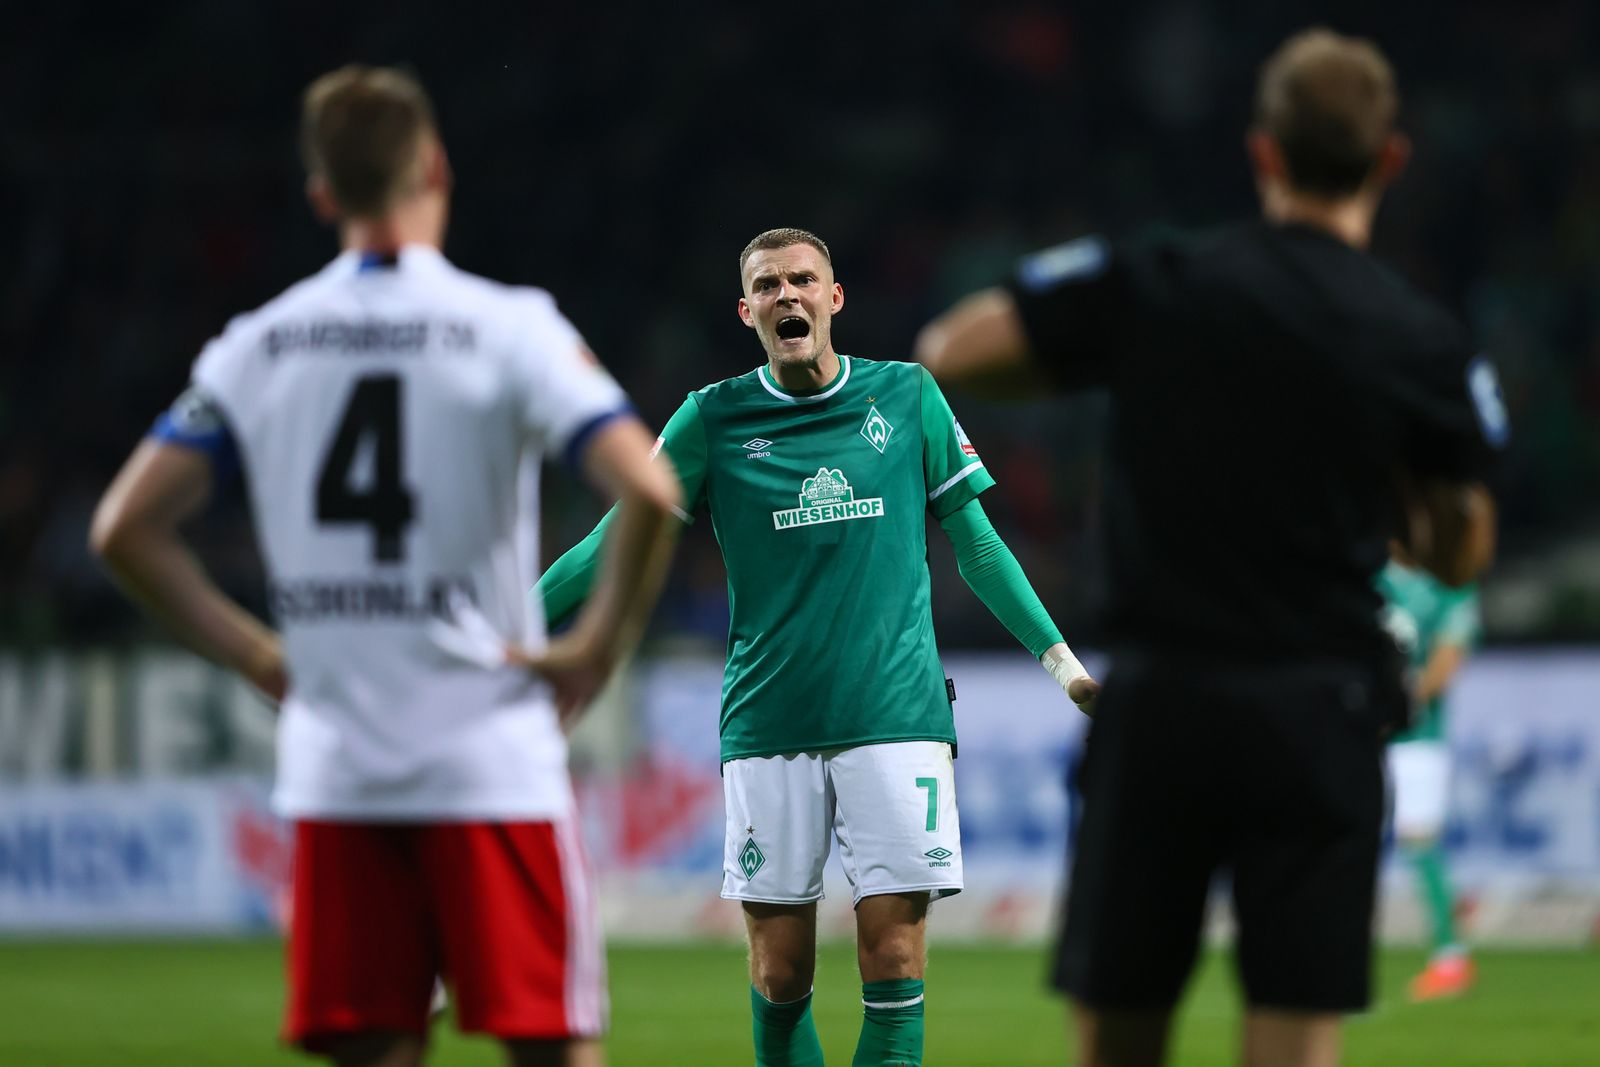 SV Werder Bremen v Hamburger SV - Second Bundesliga